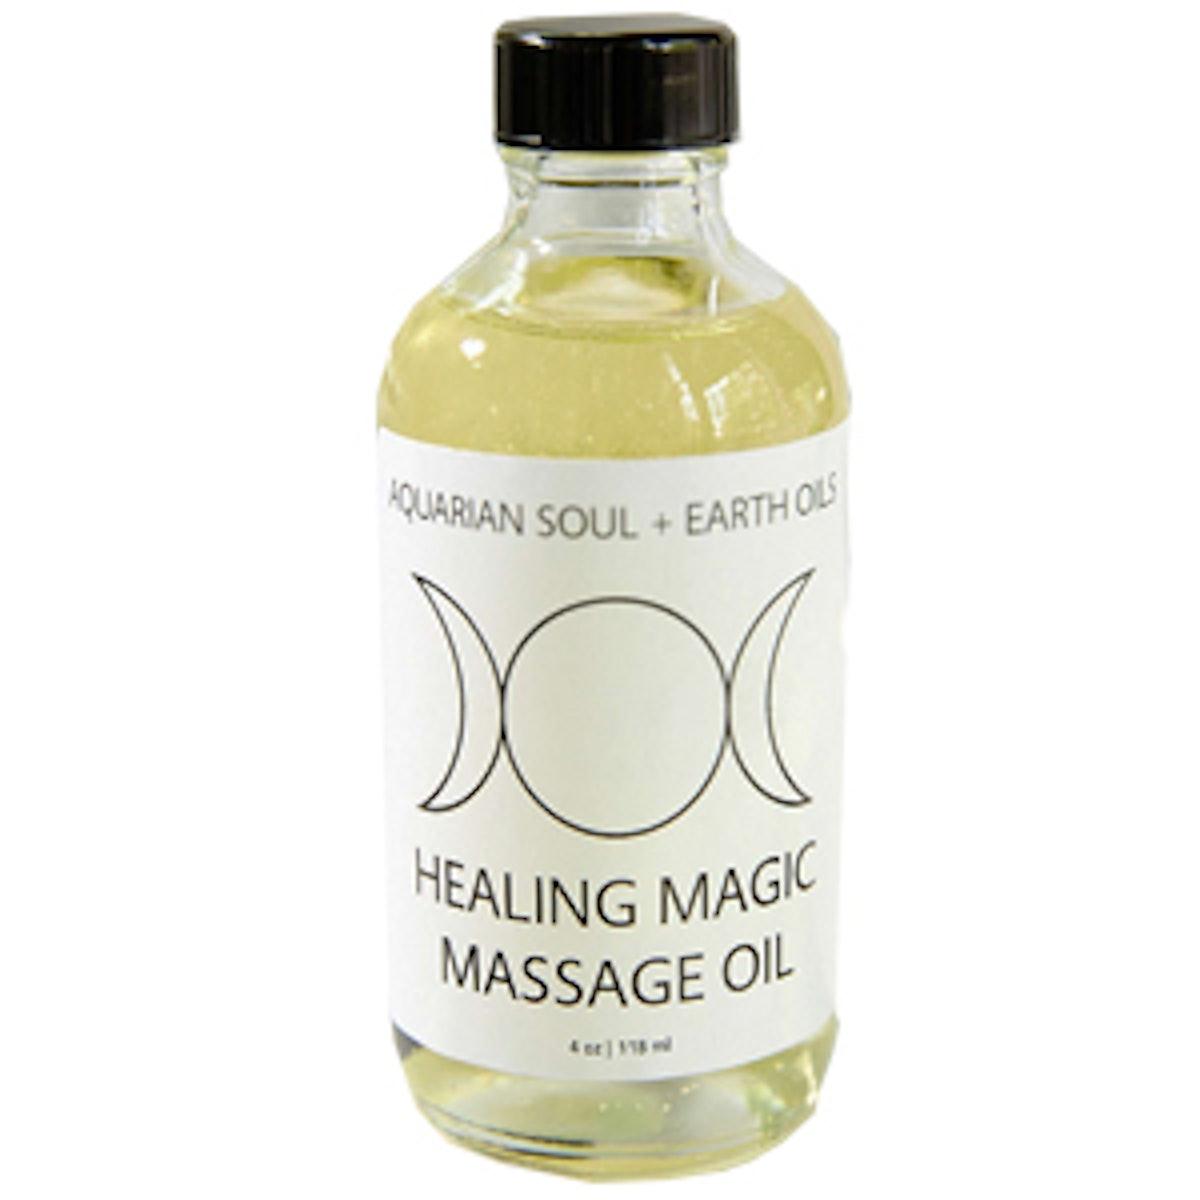 Healing Magic Gemstone Massage Oil